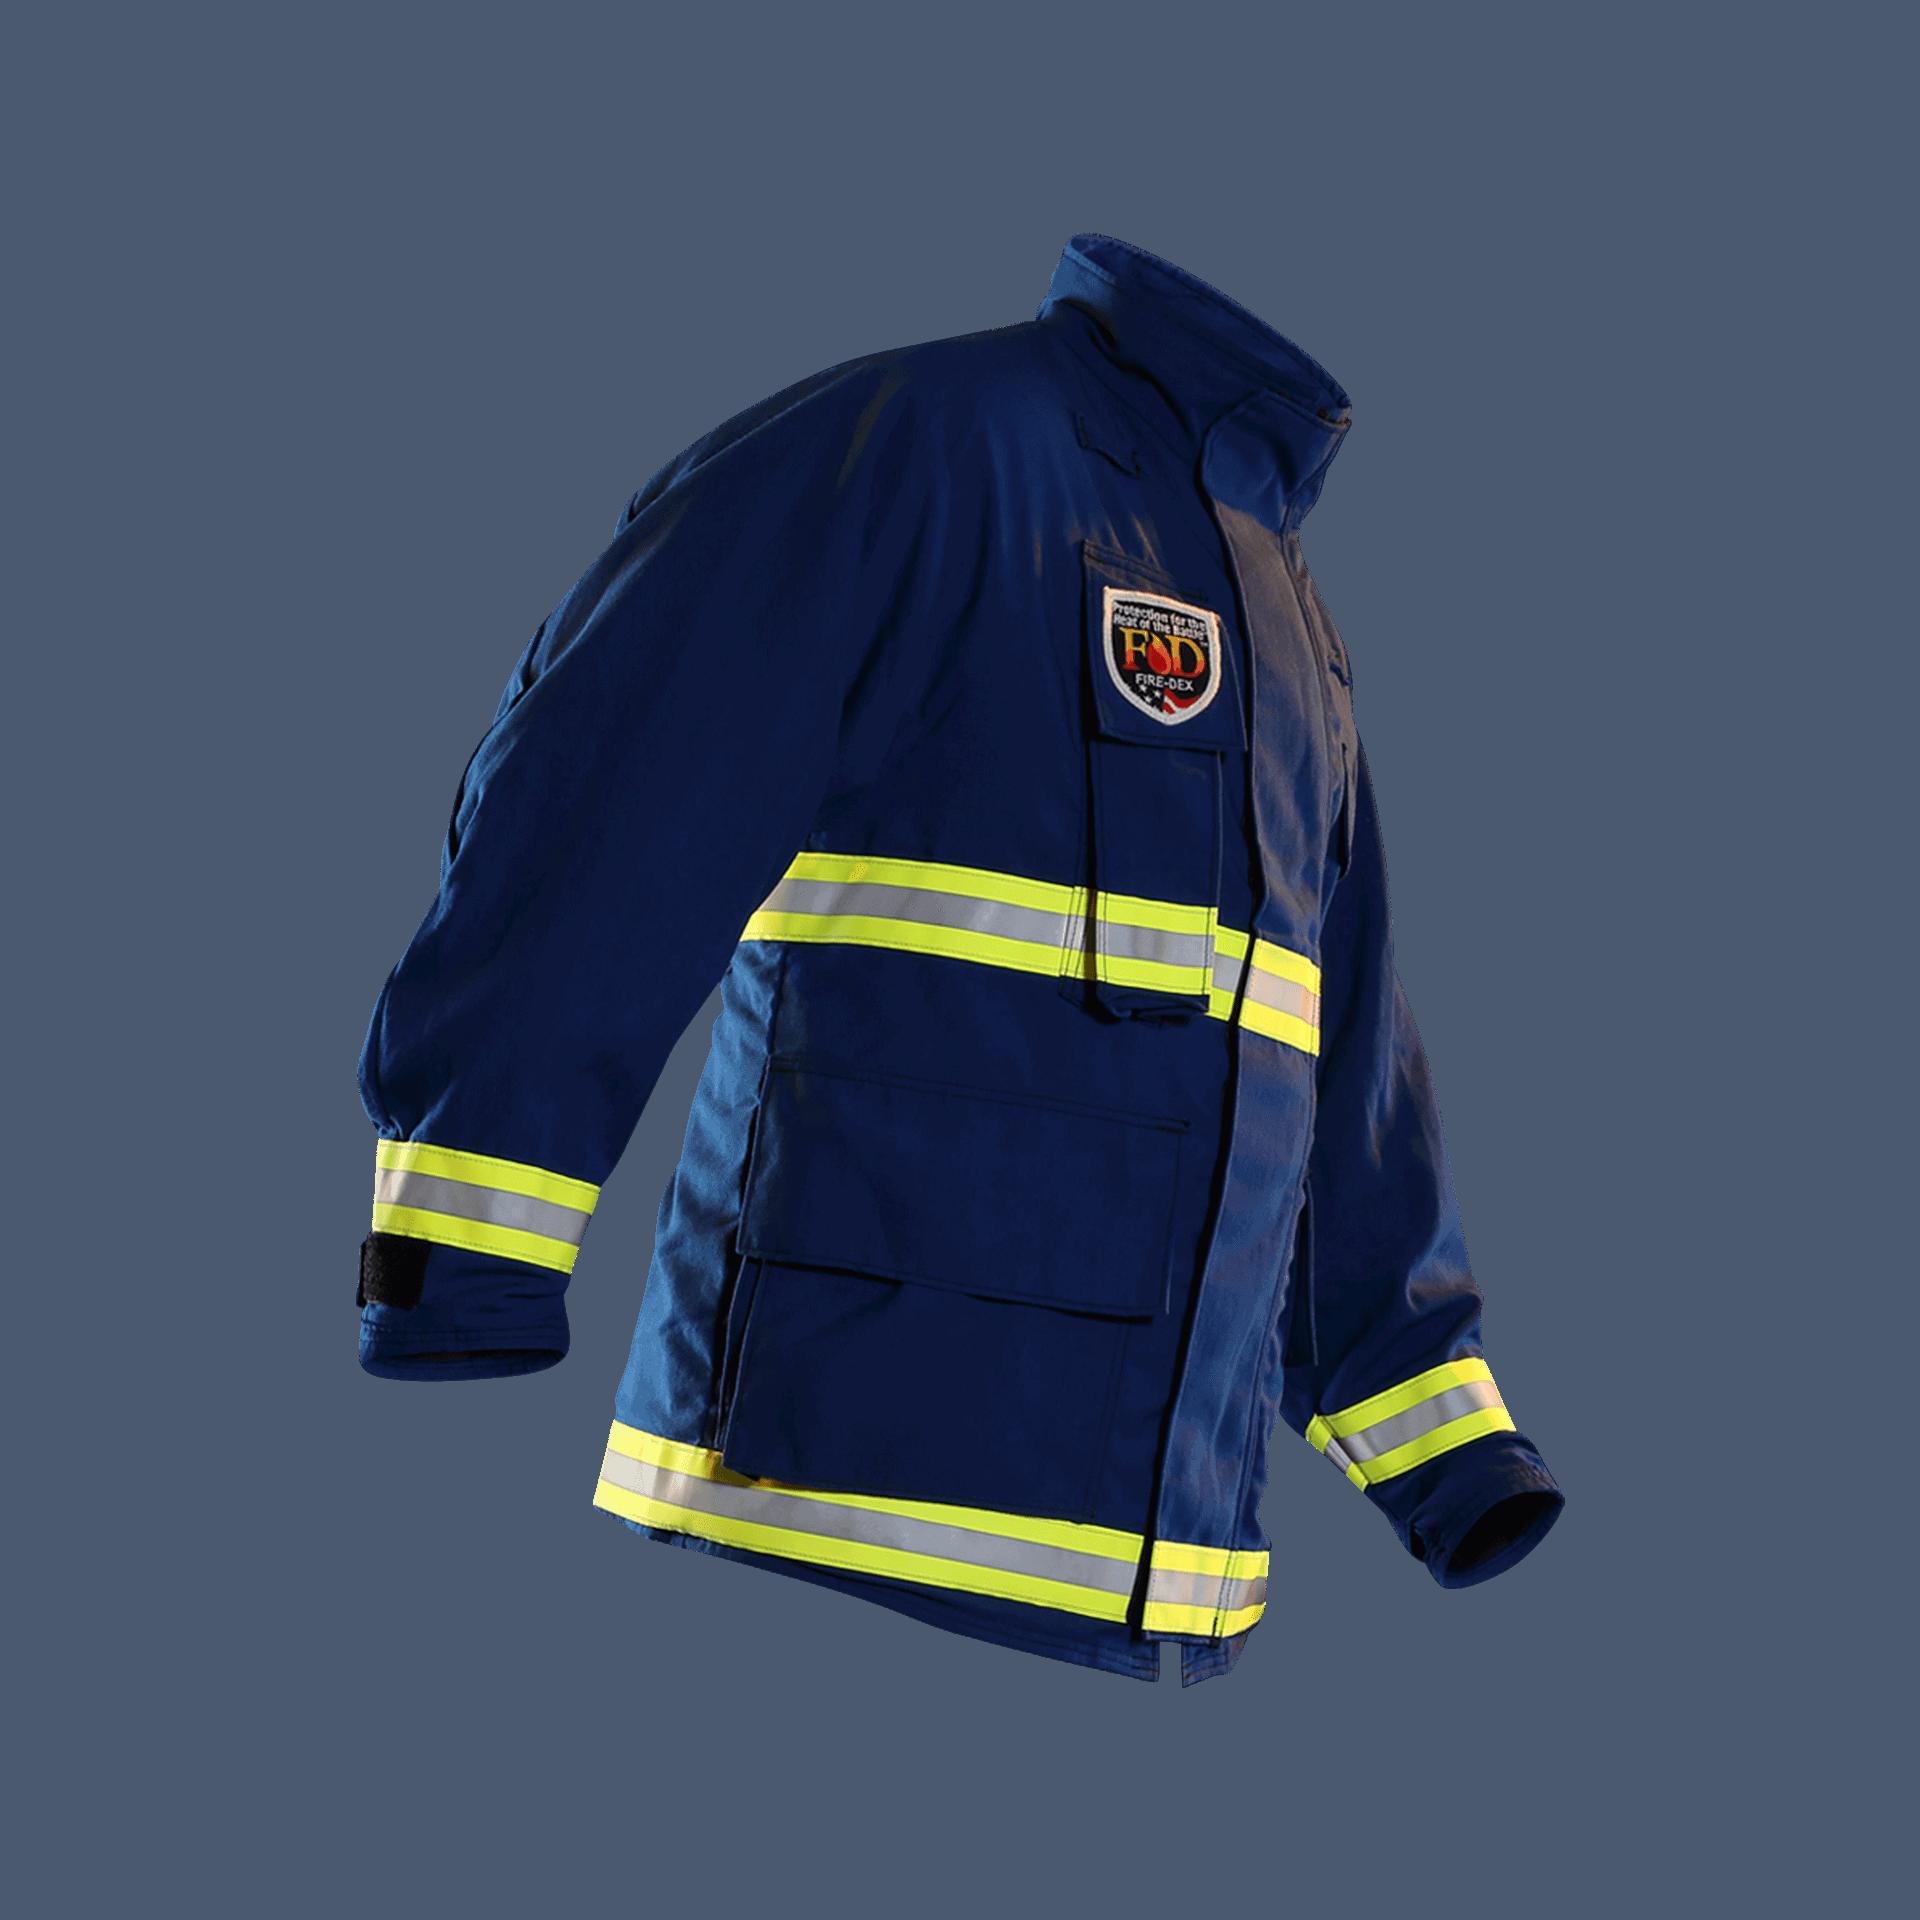 EMS gear- jacket